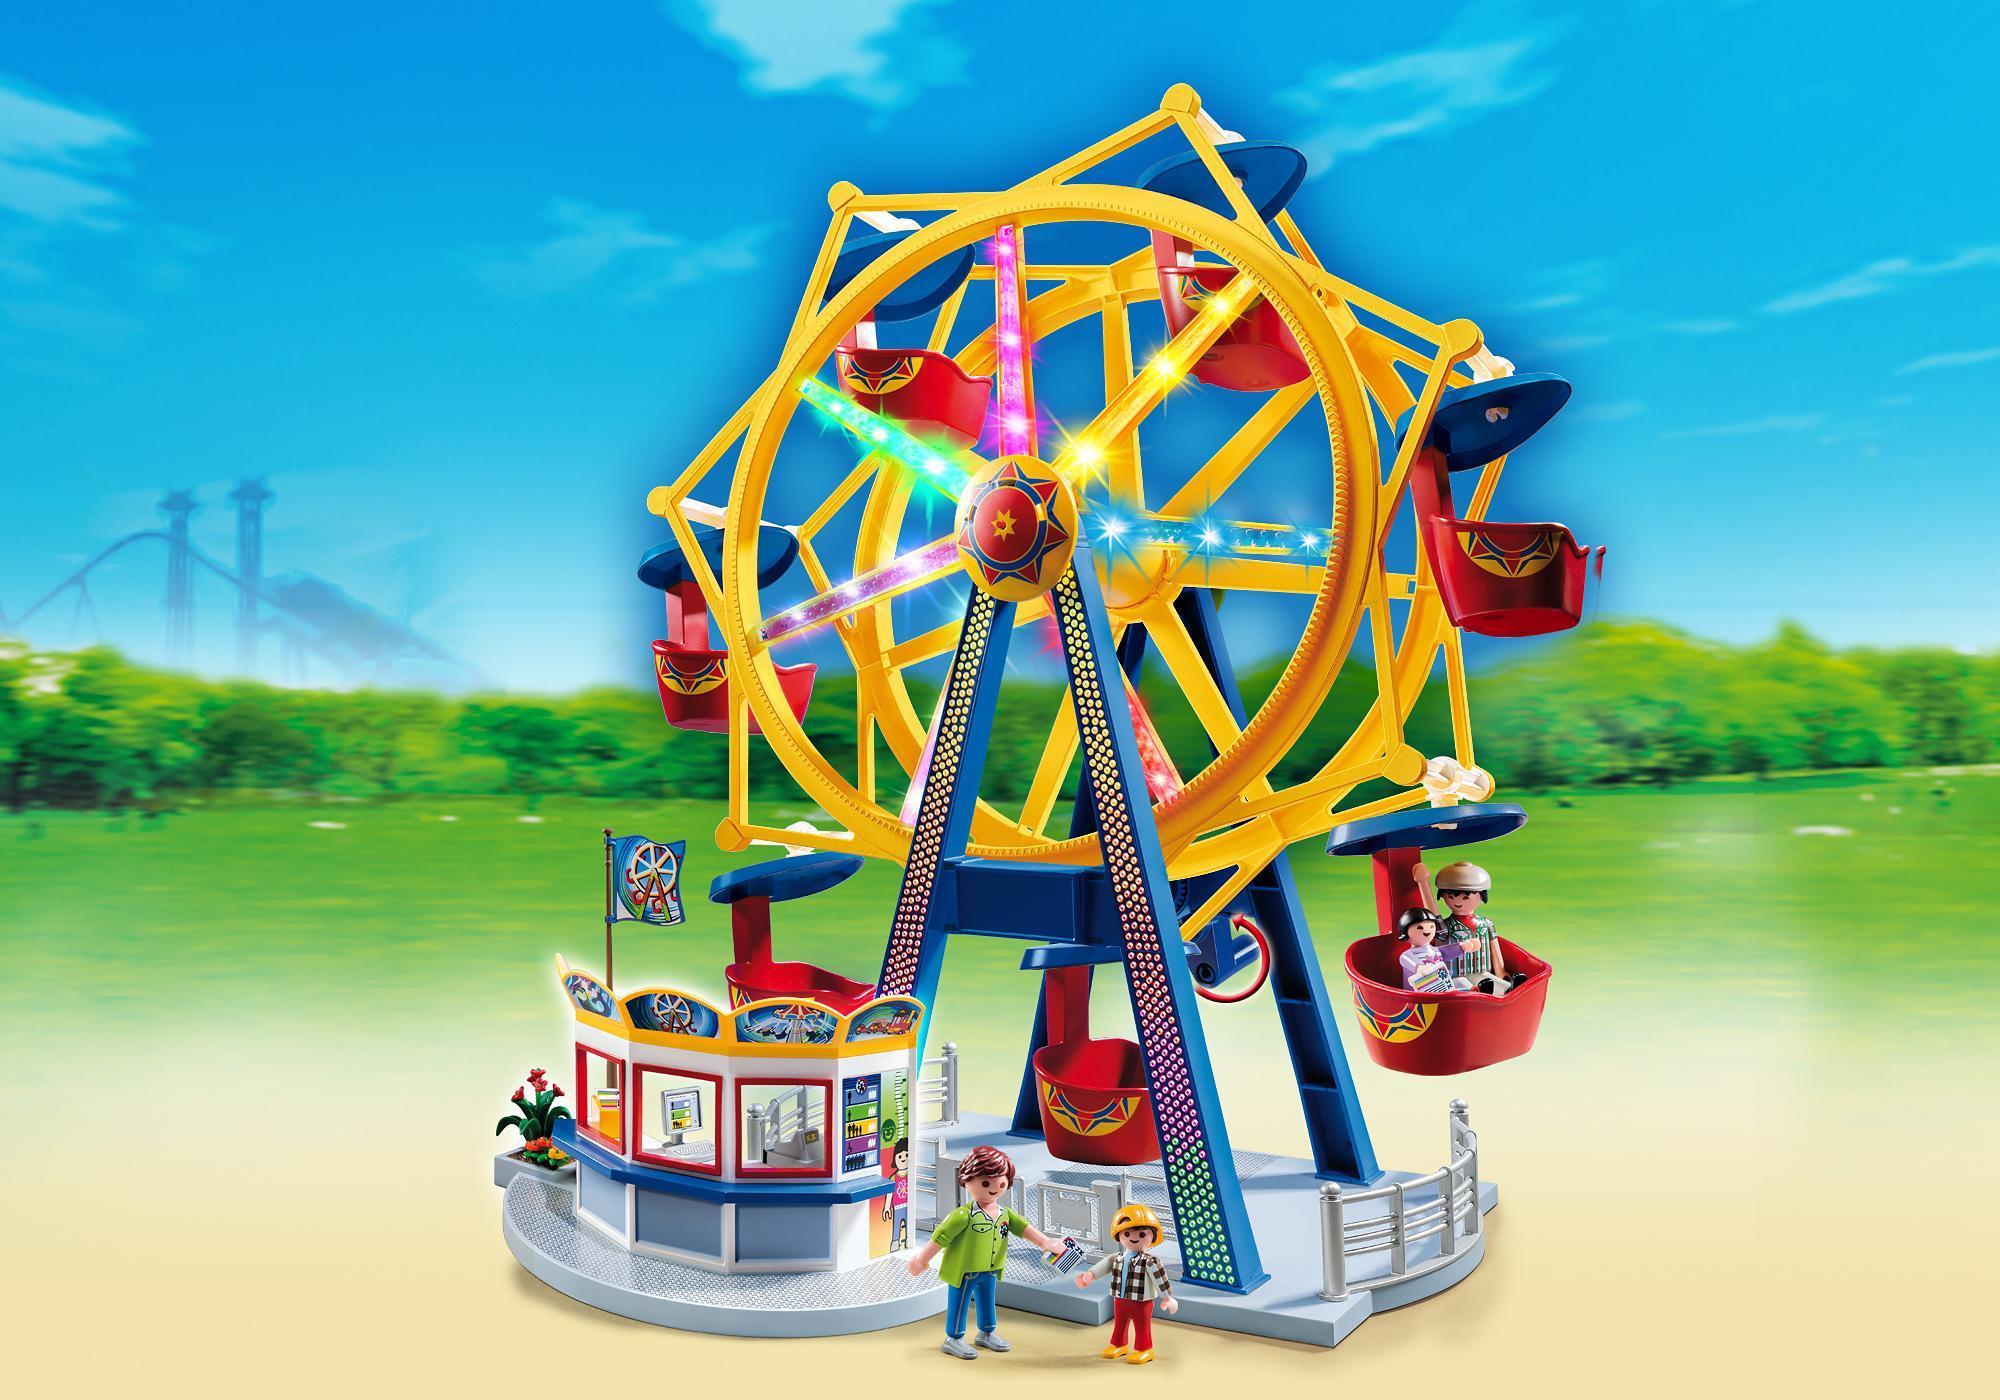 http://media.playmobil.com/i/playmobil/5552_product_detail/Riesenrad mit bunter Beleuchtung